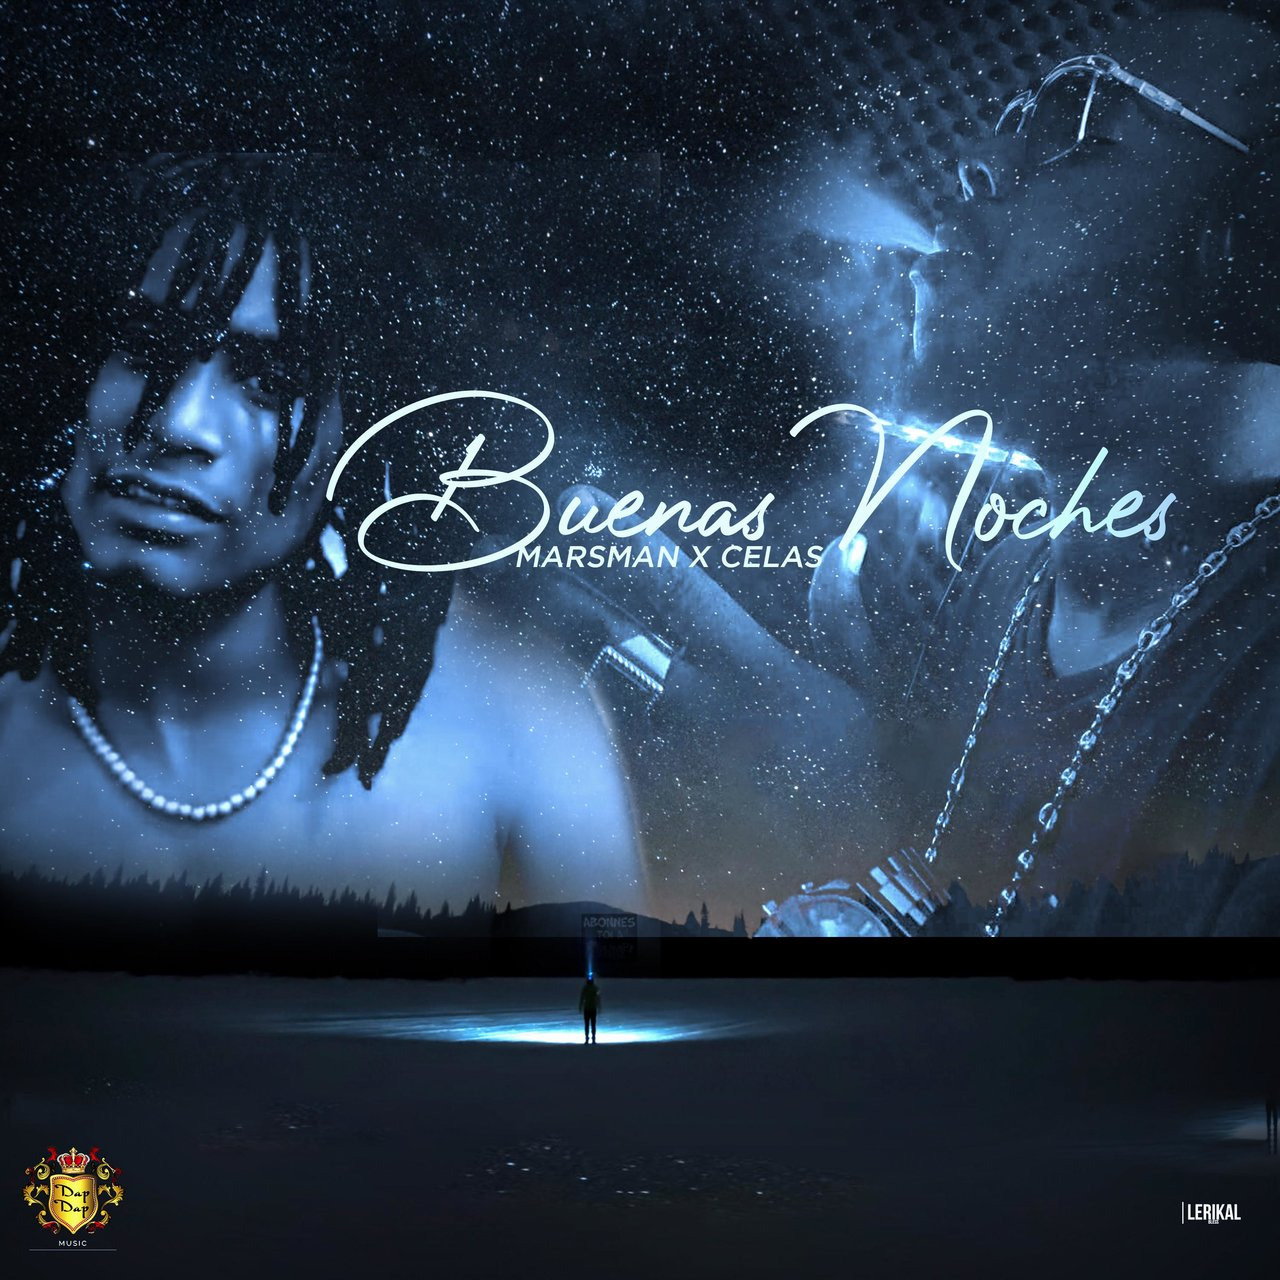 Celas - Buenas Noches (ft. Marsman) (Cover)